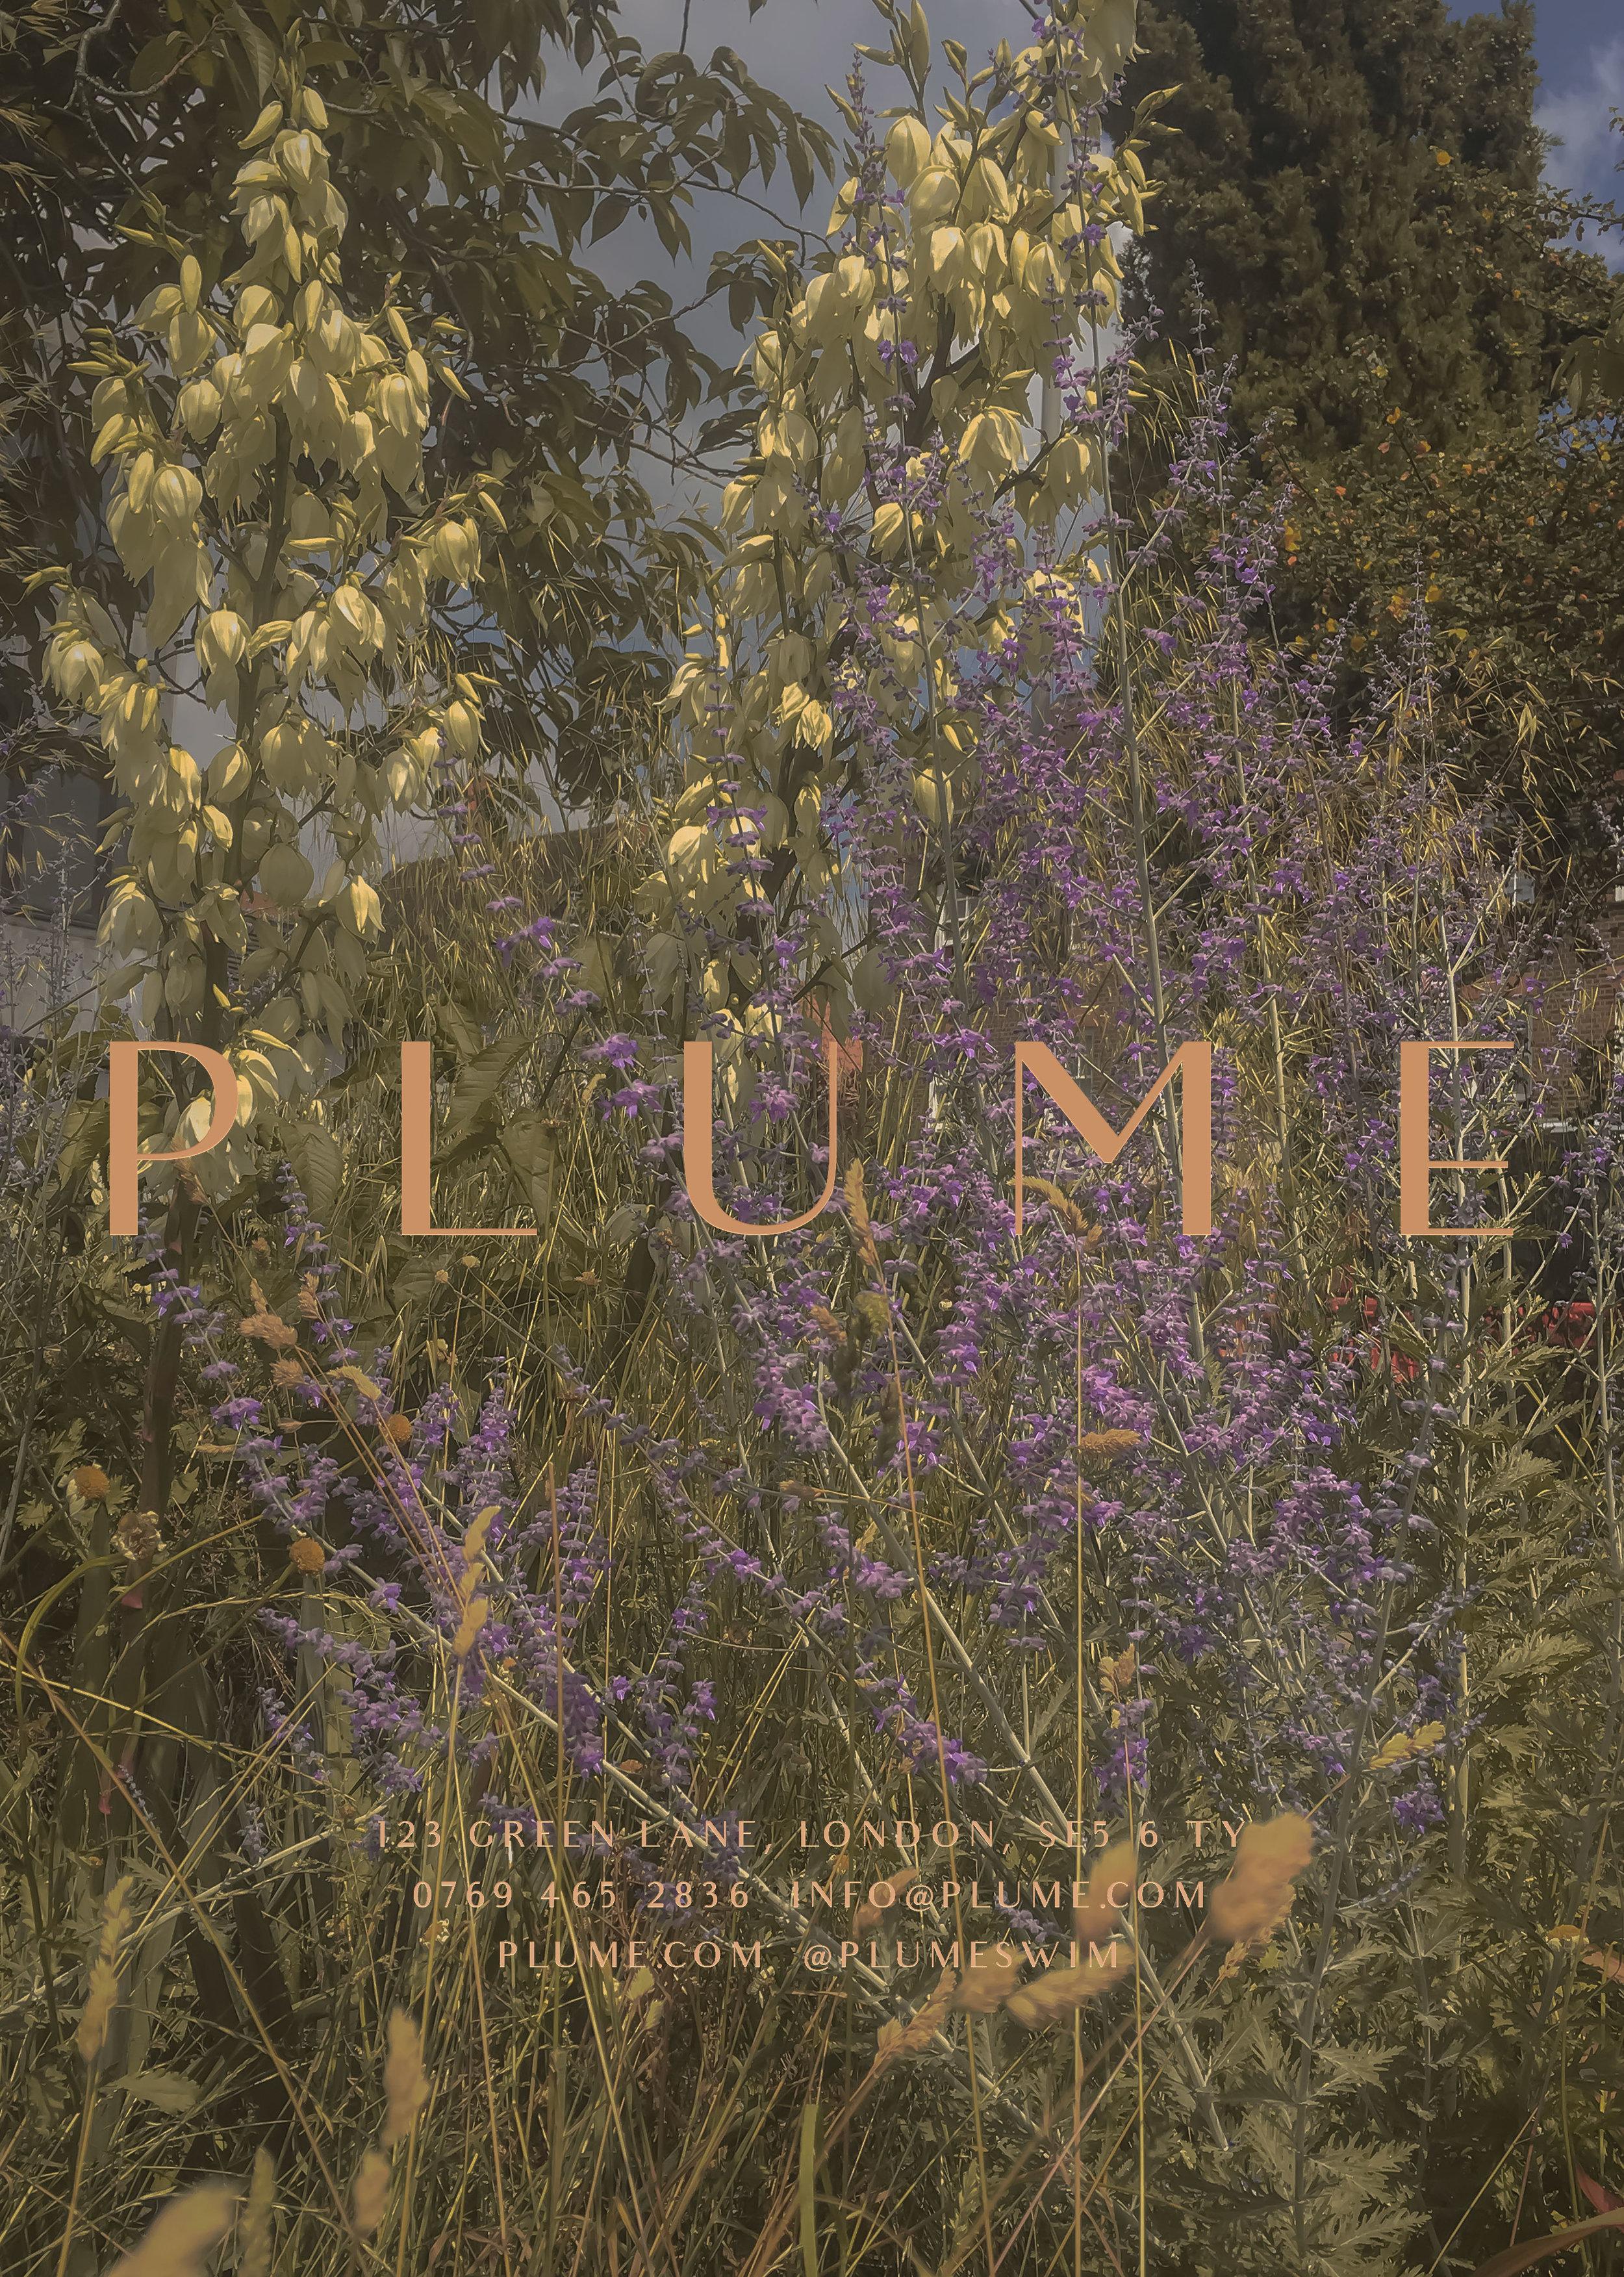 plume-fashion-logo-design-flowers-loolaadesigns.jpg